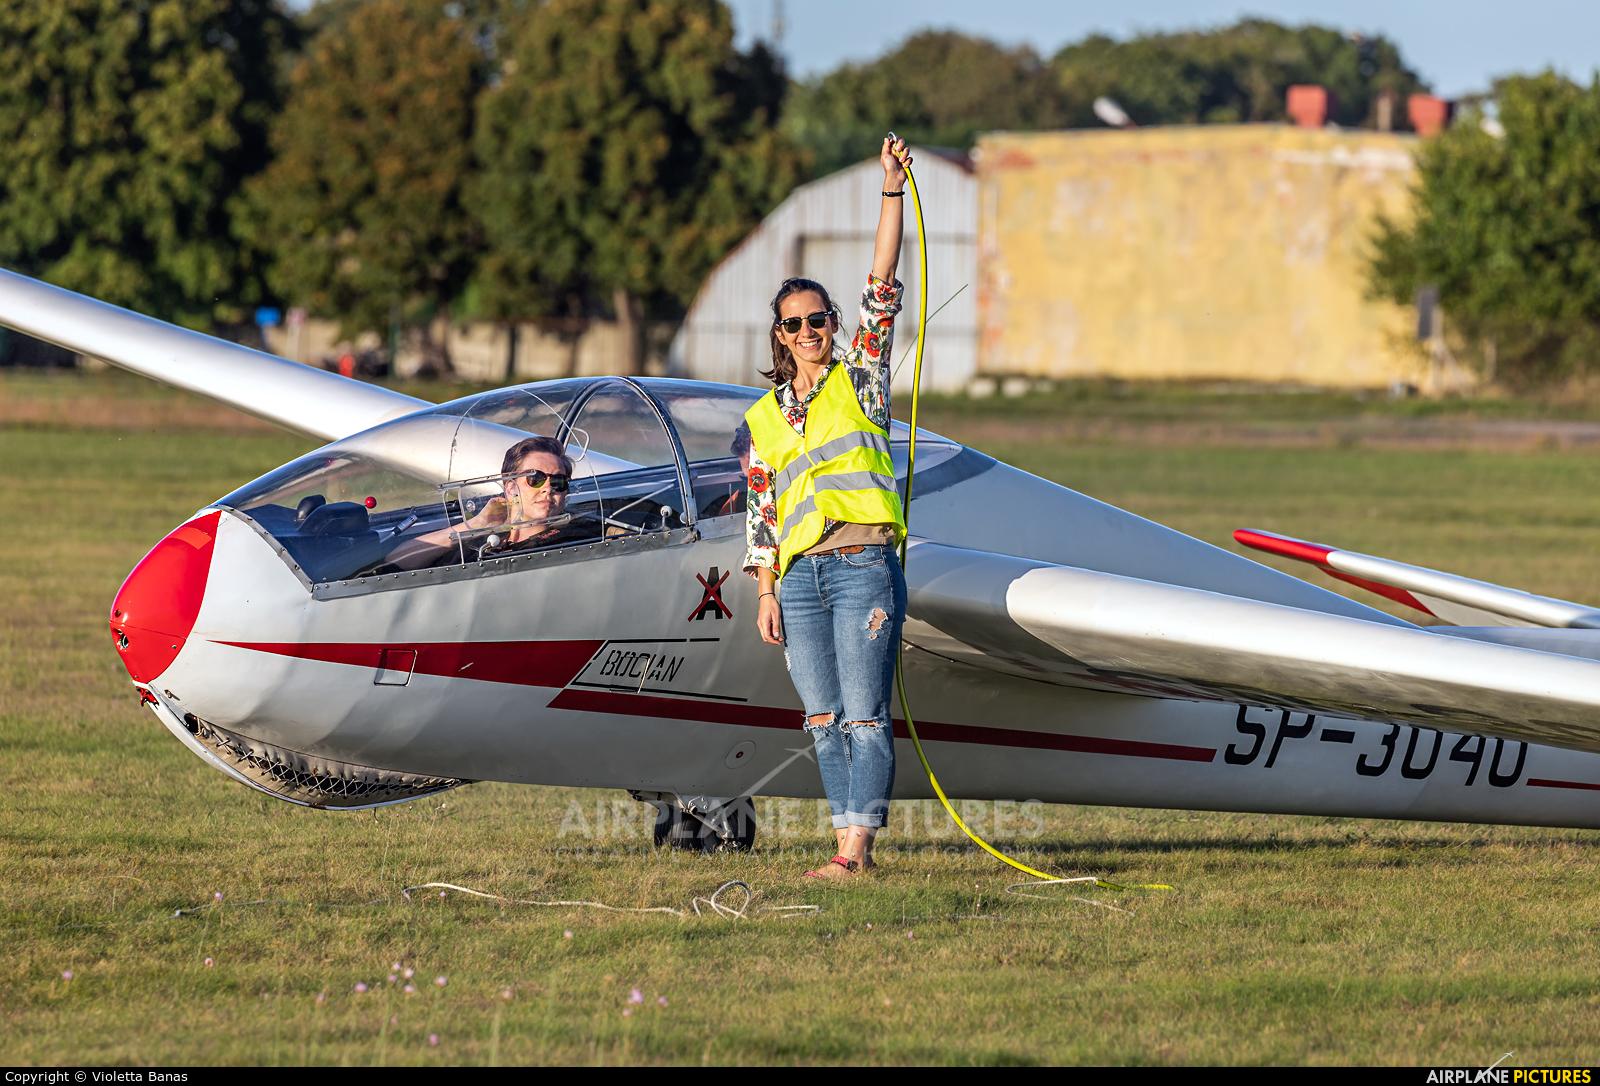 Aeroklub Bydgoski SP-3040 aircraft at Bydgoszcz - Szwederowo